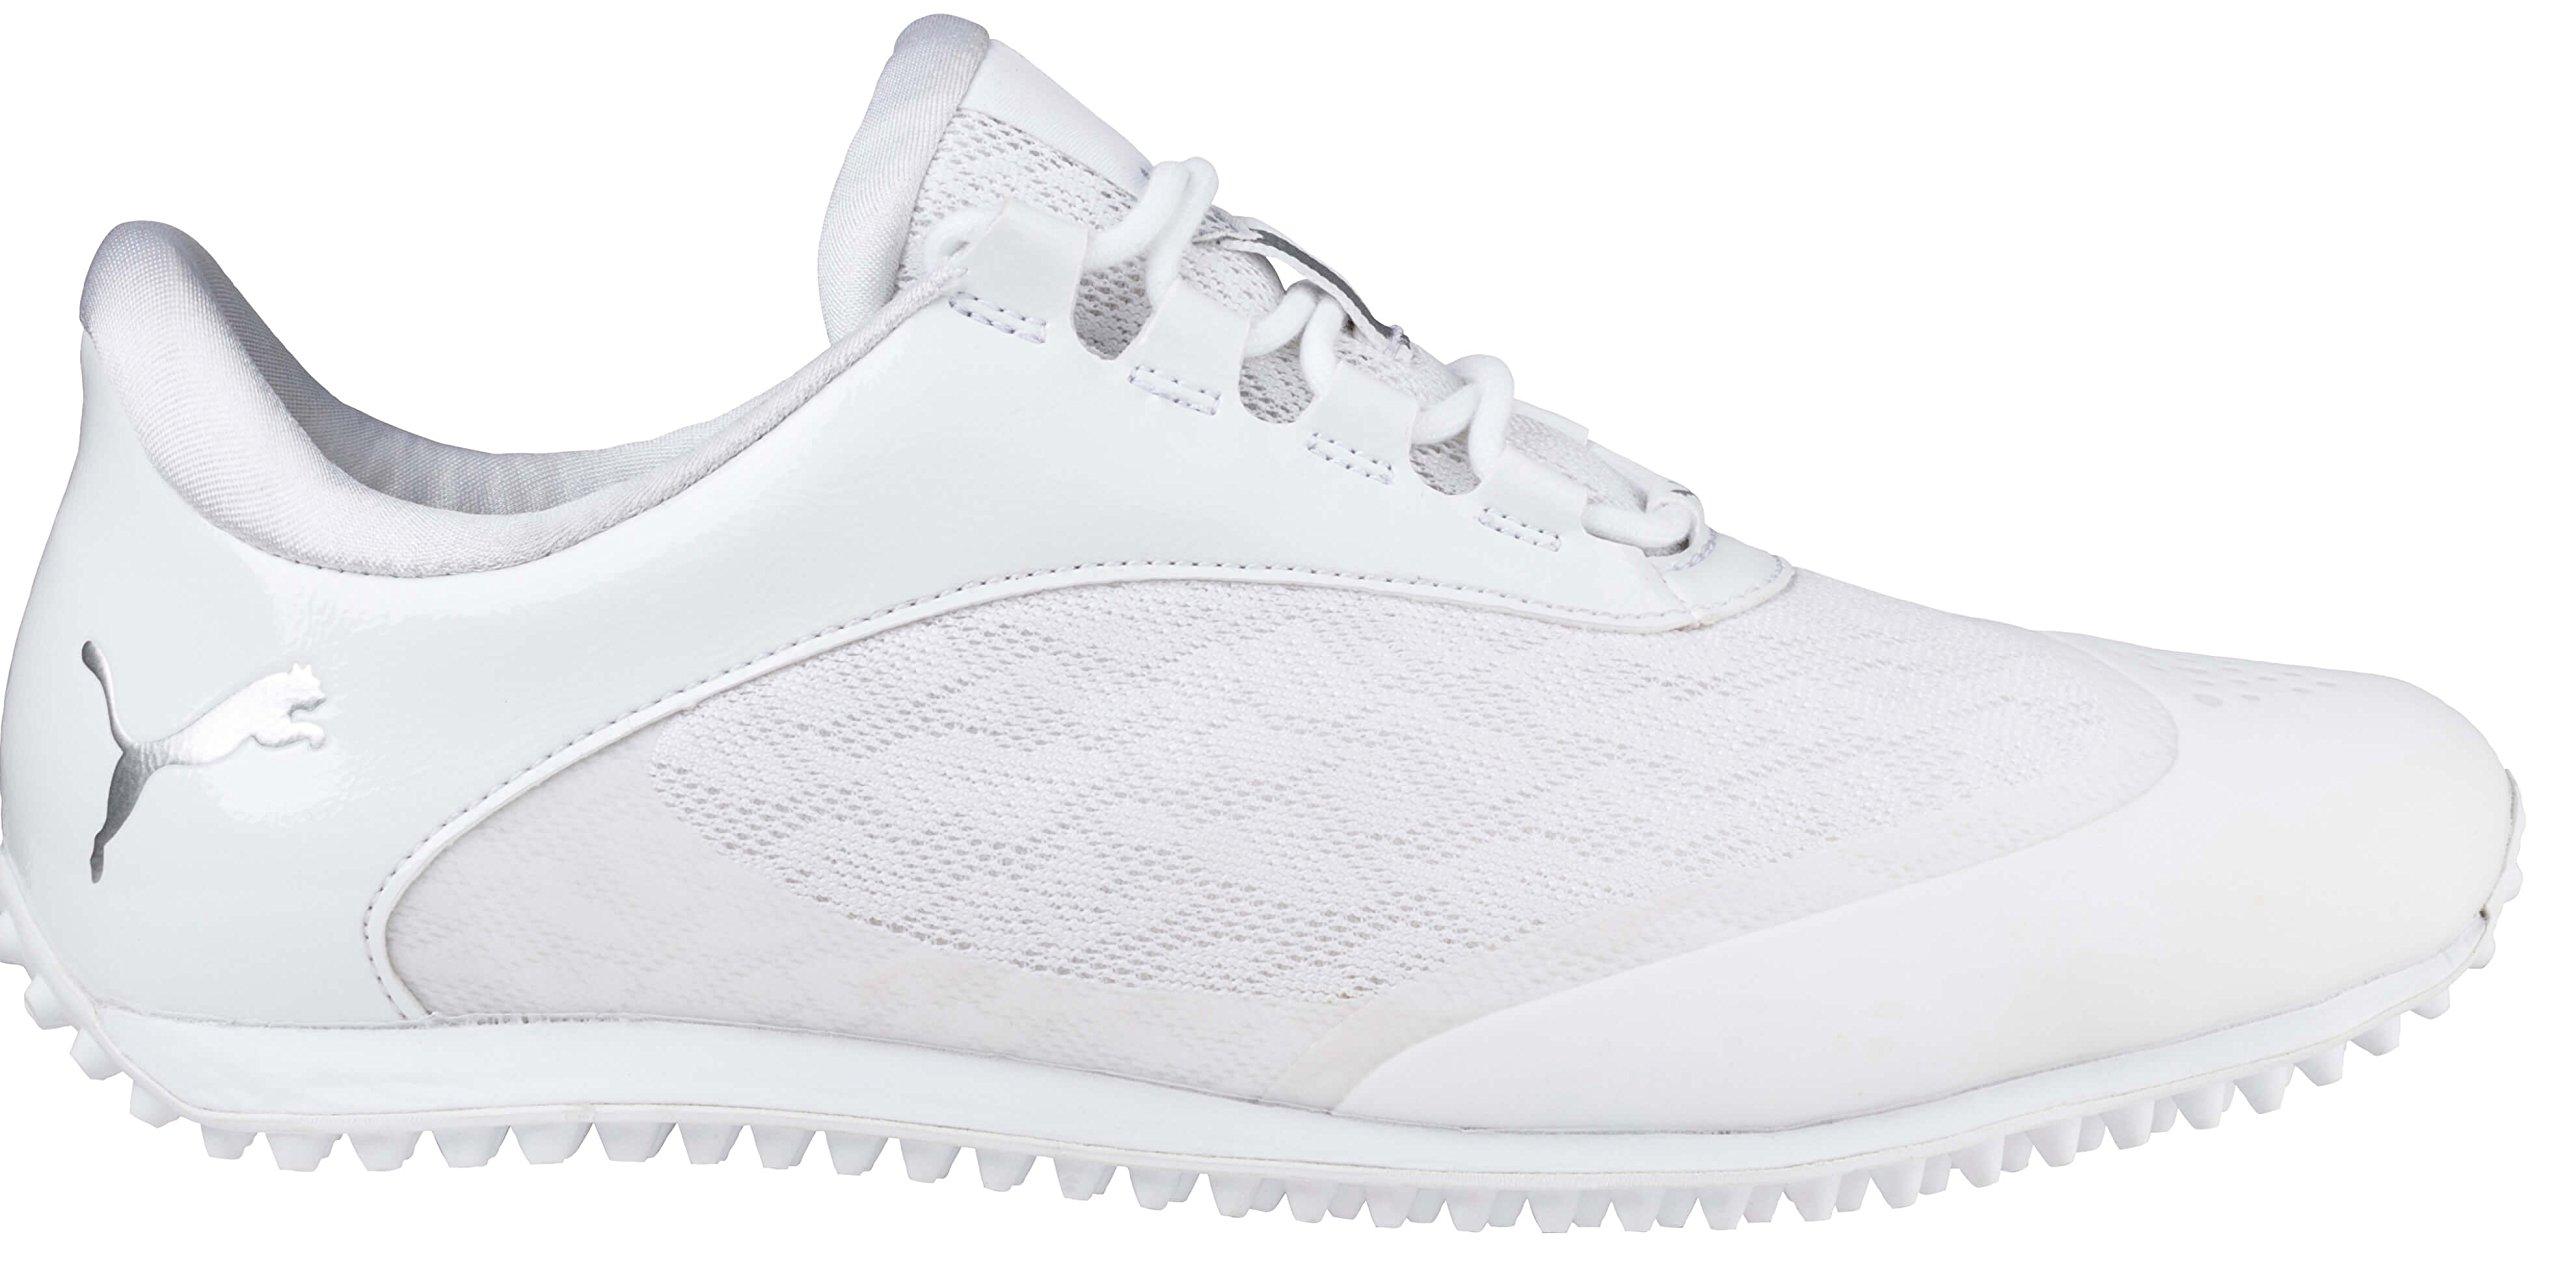 PUMA Golf Women's Summercat Sport Golf Shoe, White/Silver/High Rise, 5.5 Medium US